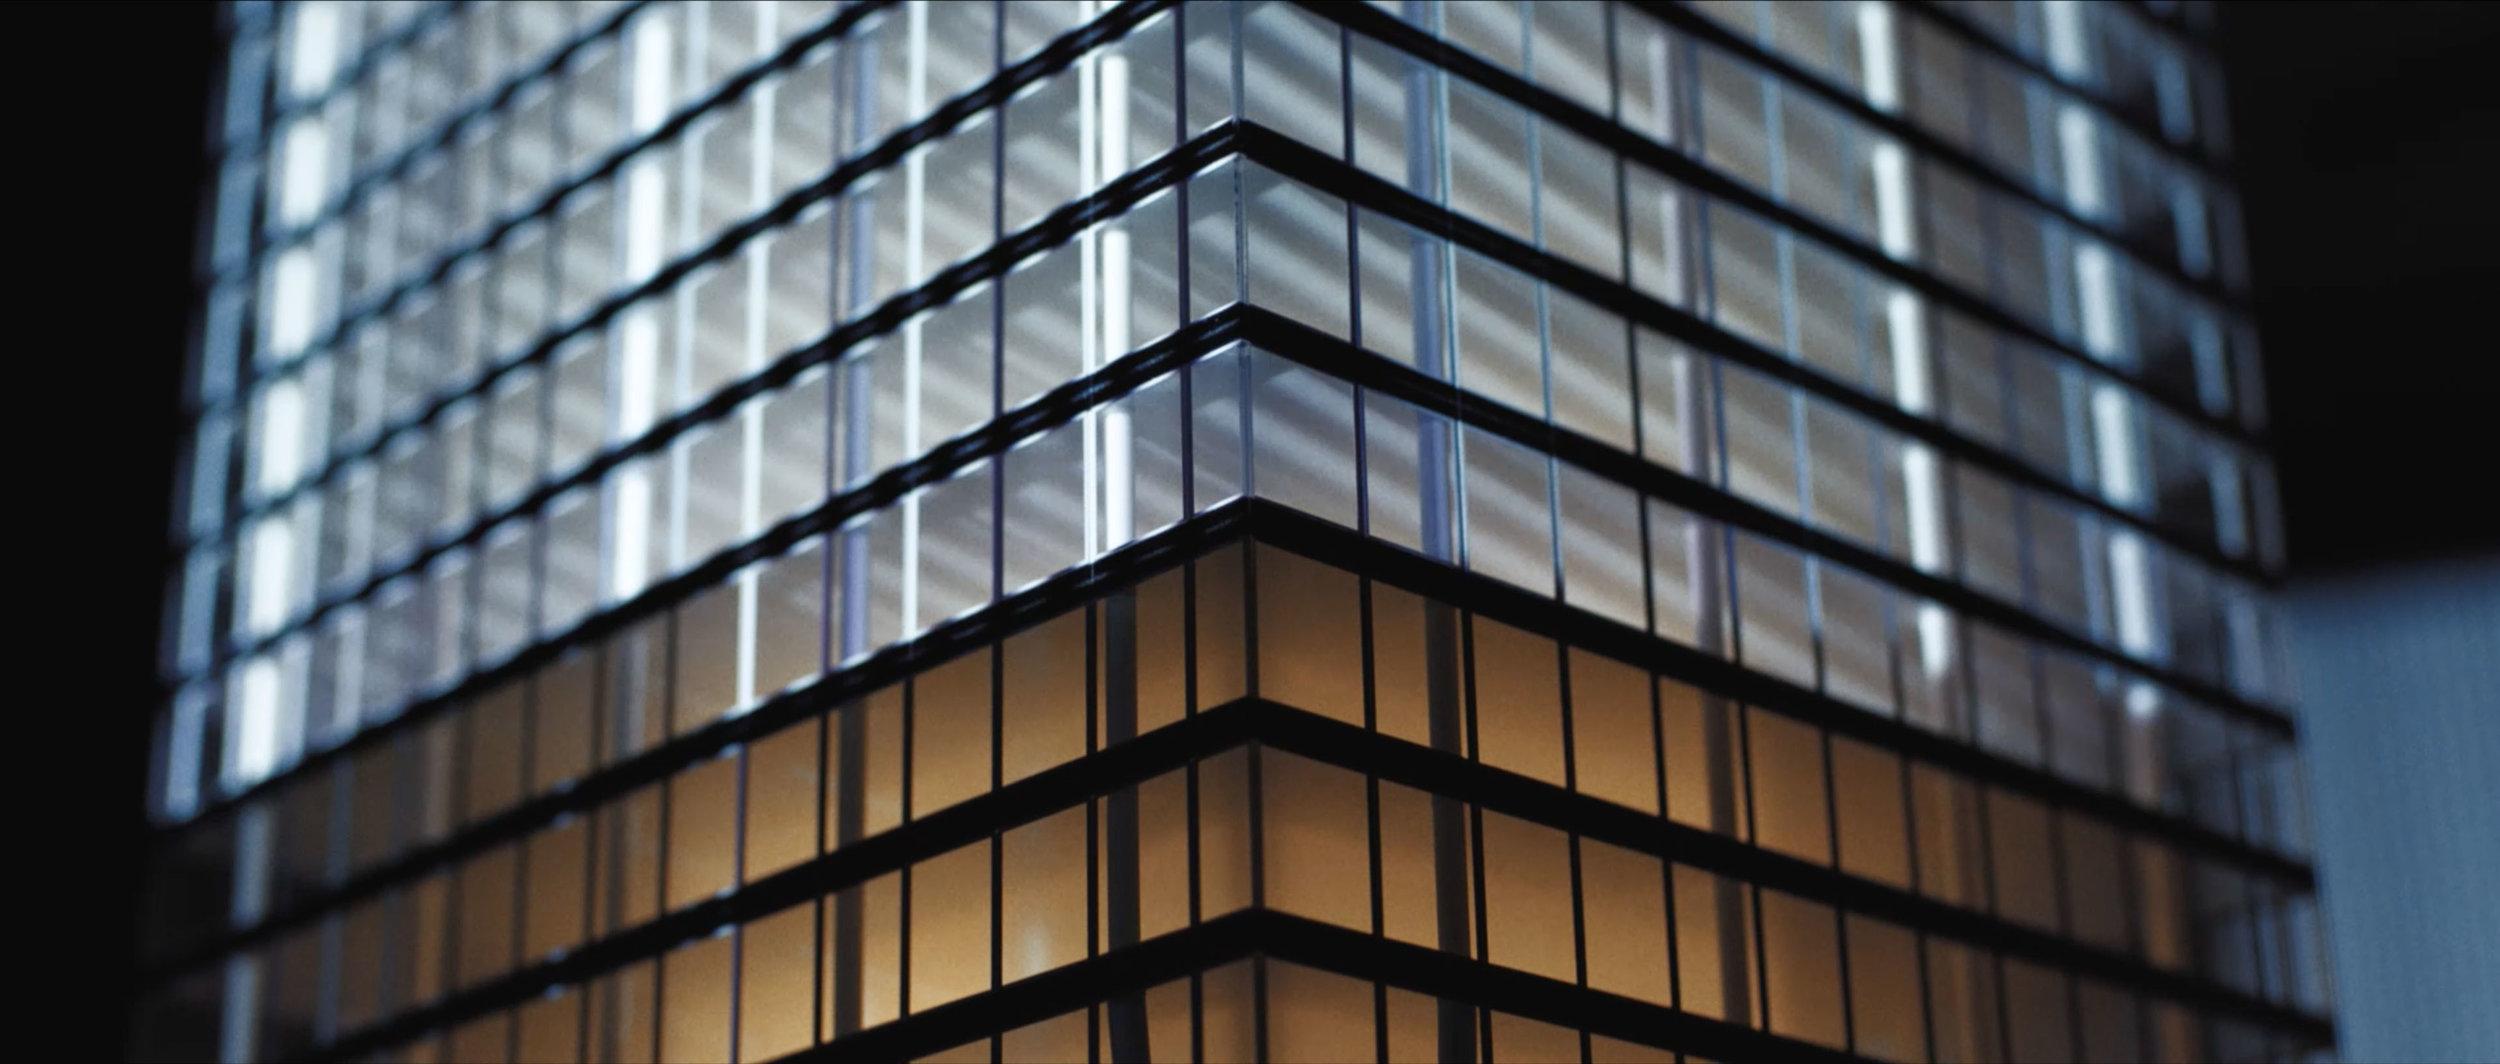 Omniturm-Frankfurt-Tishman-Speyer-Architecture-Idea-Art-City_03.jpg